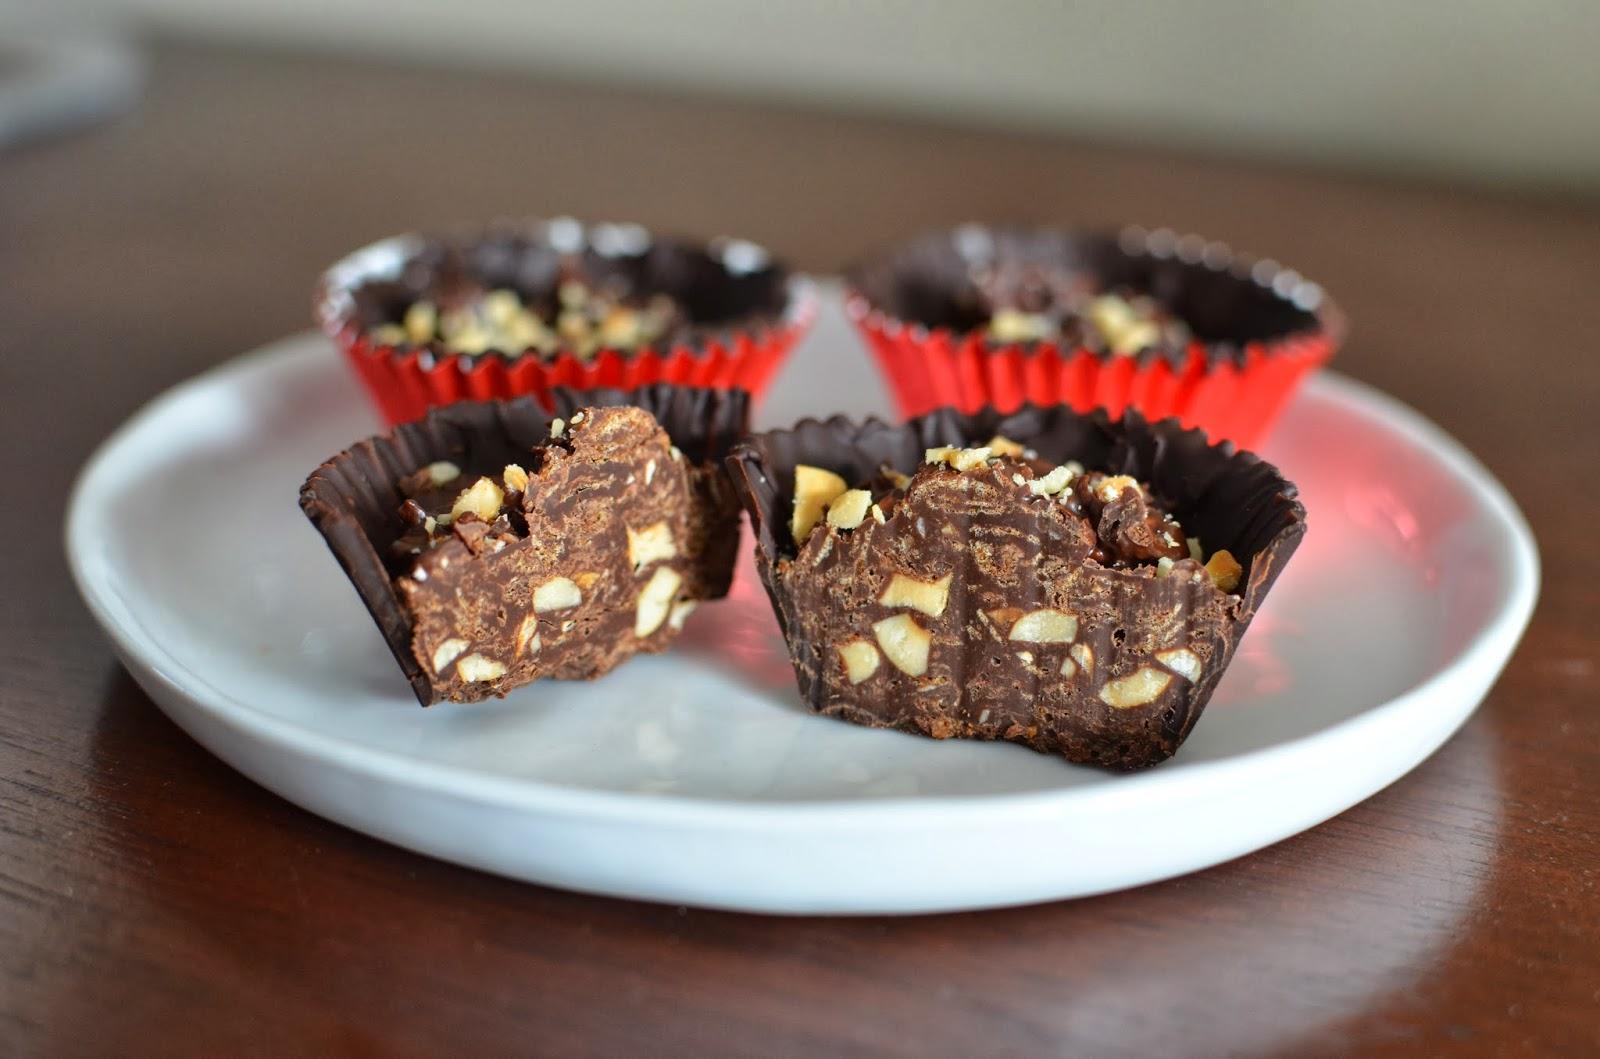 Chocolate-Hazelnut Mousse-Filled Cups Recipe — Dishmaps